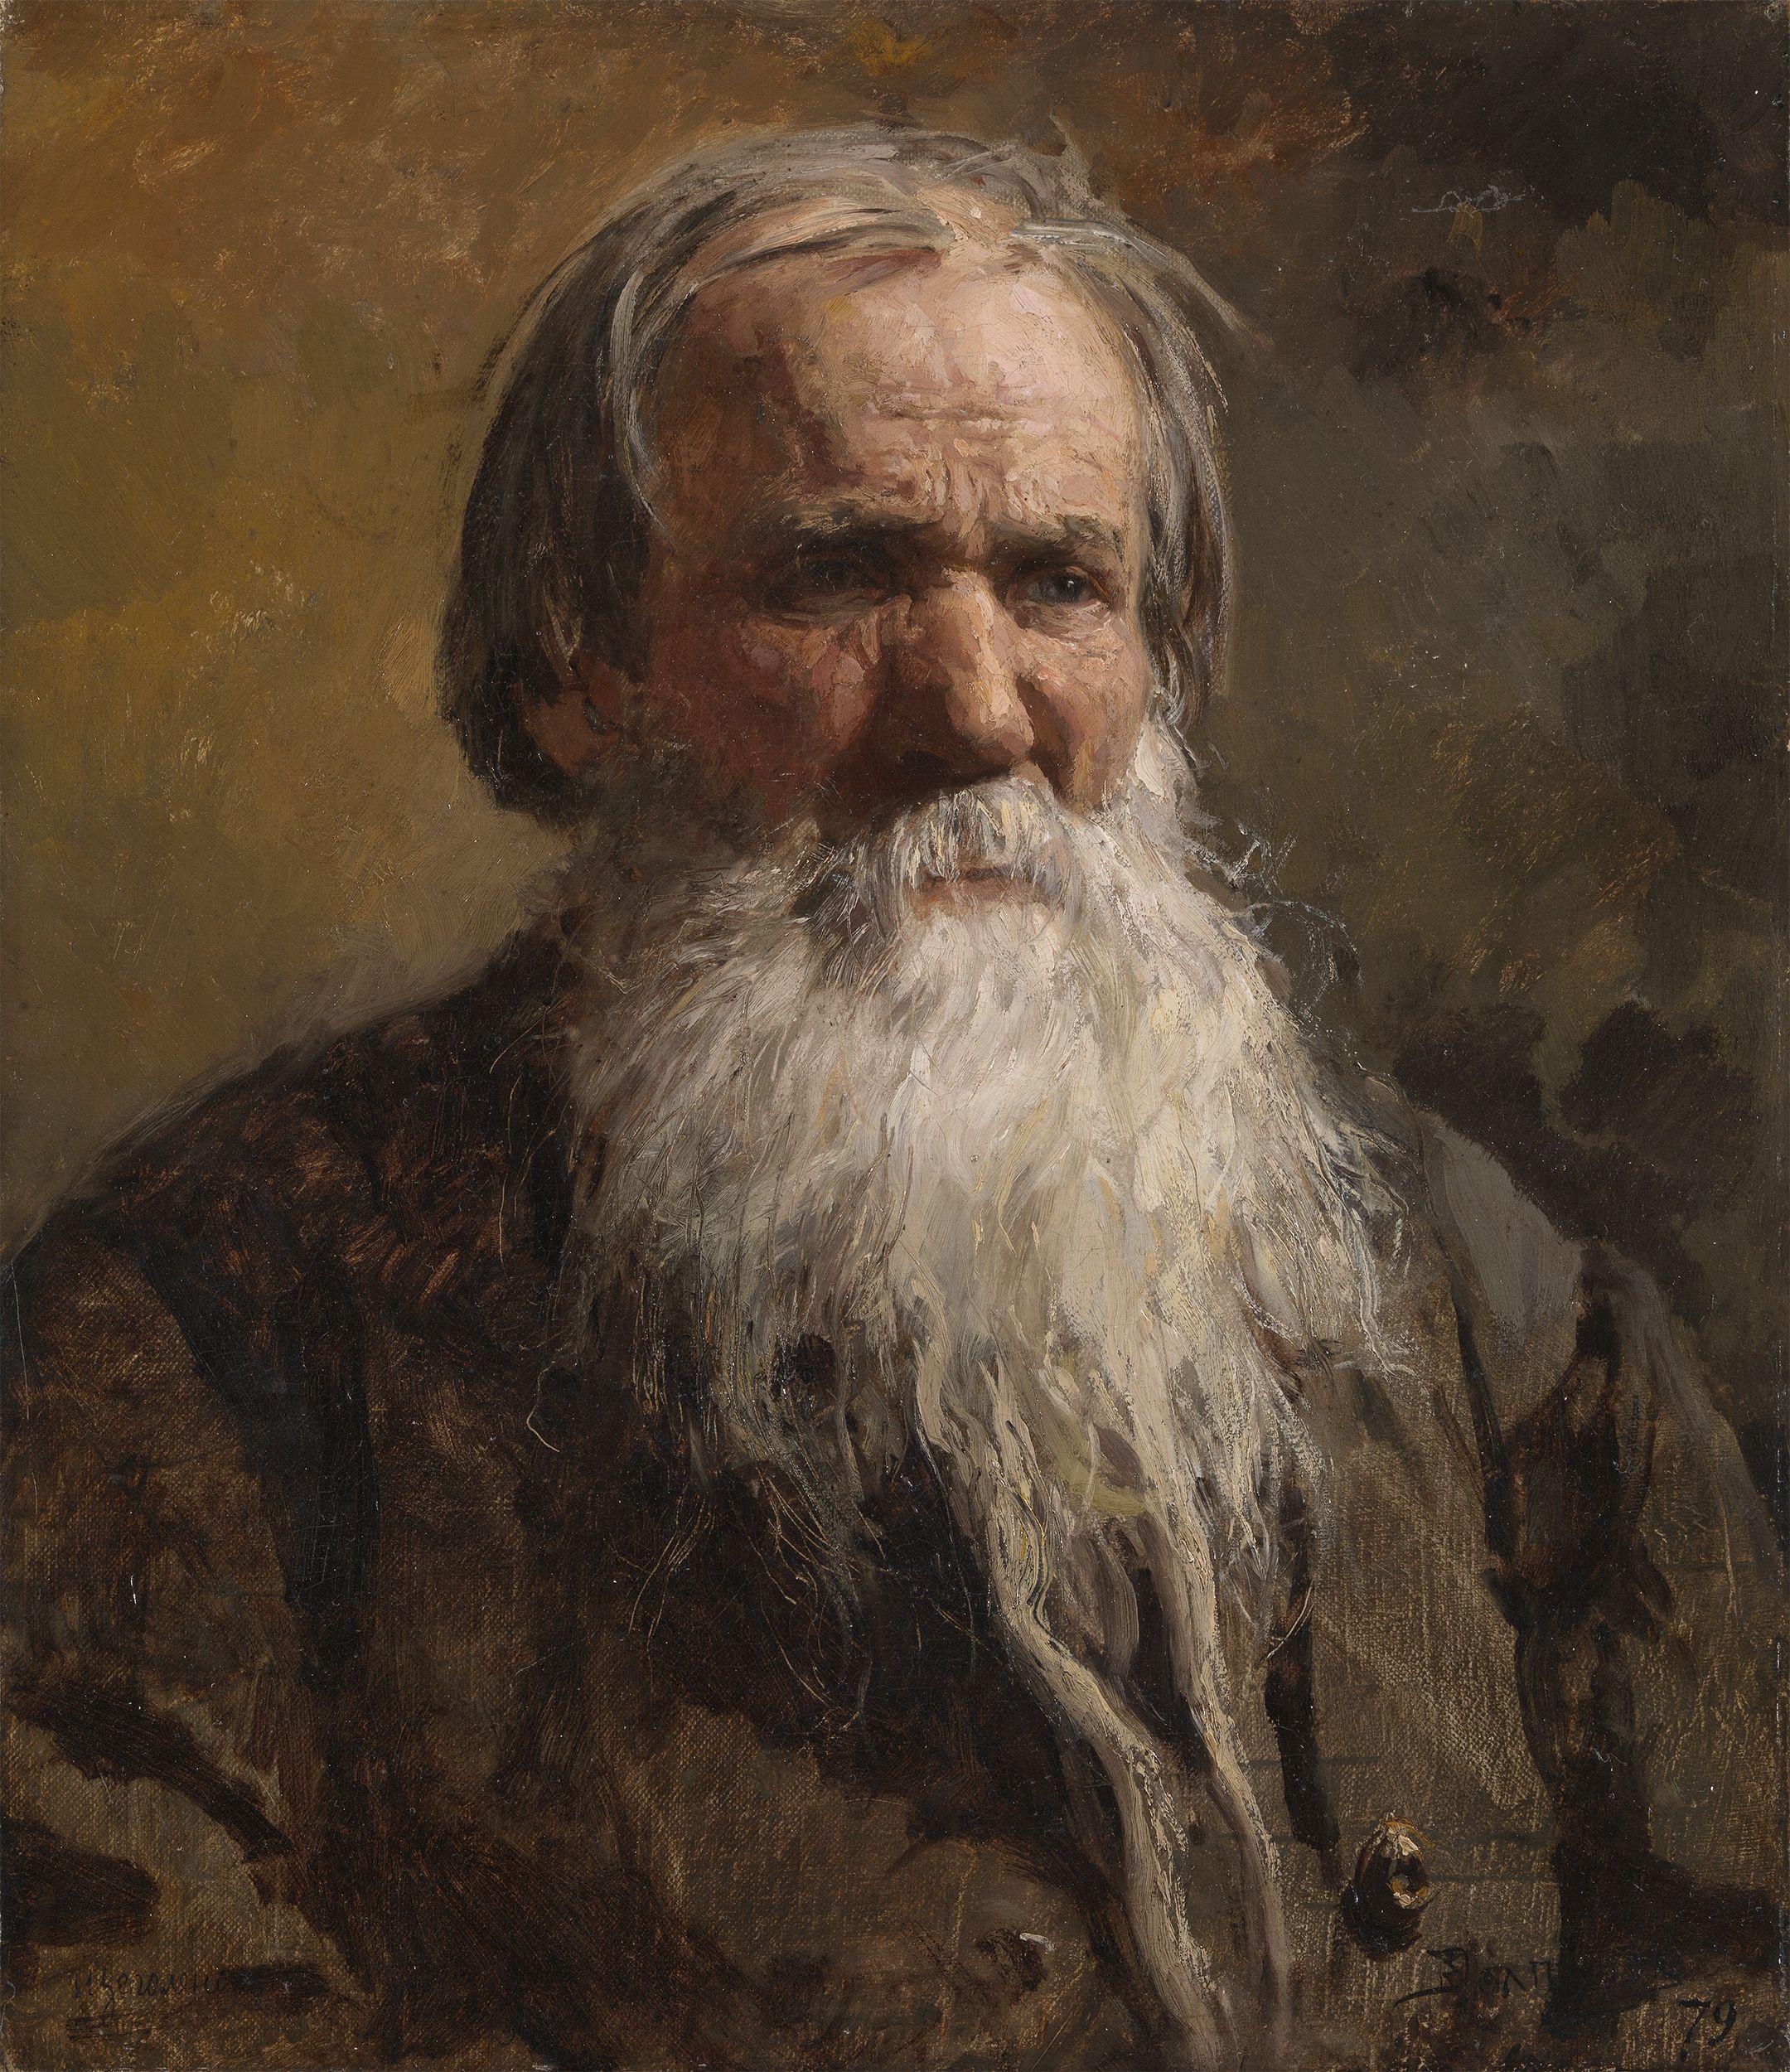 Russian artist Vasily Polenov: biography, creativity, and interesting facts 70